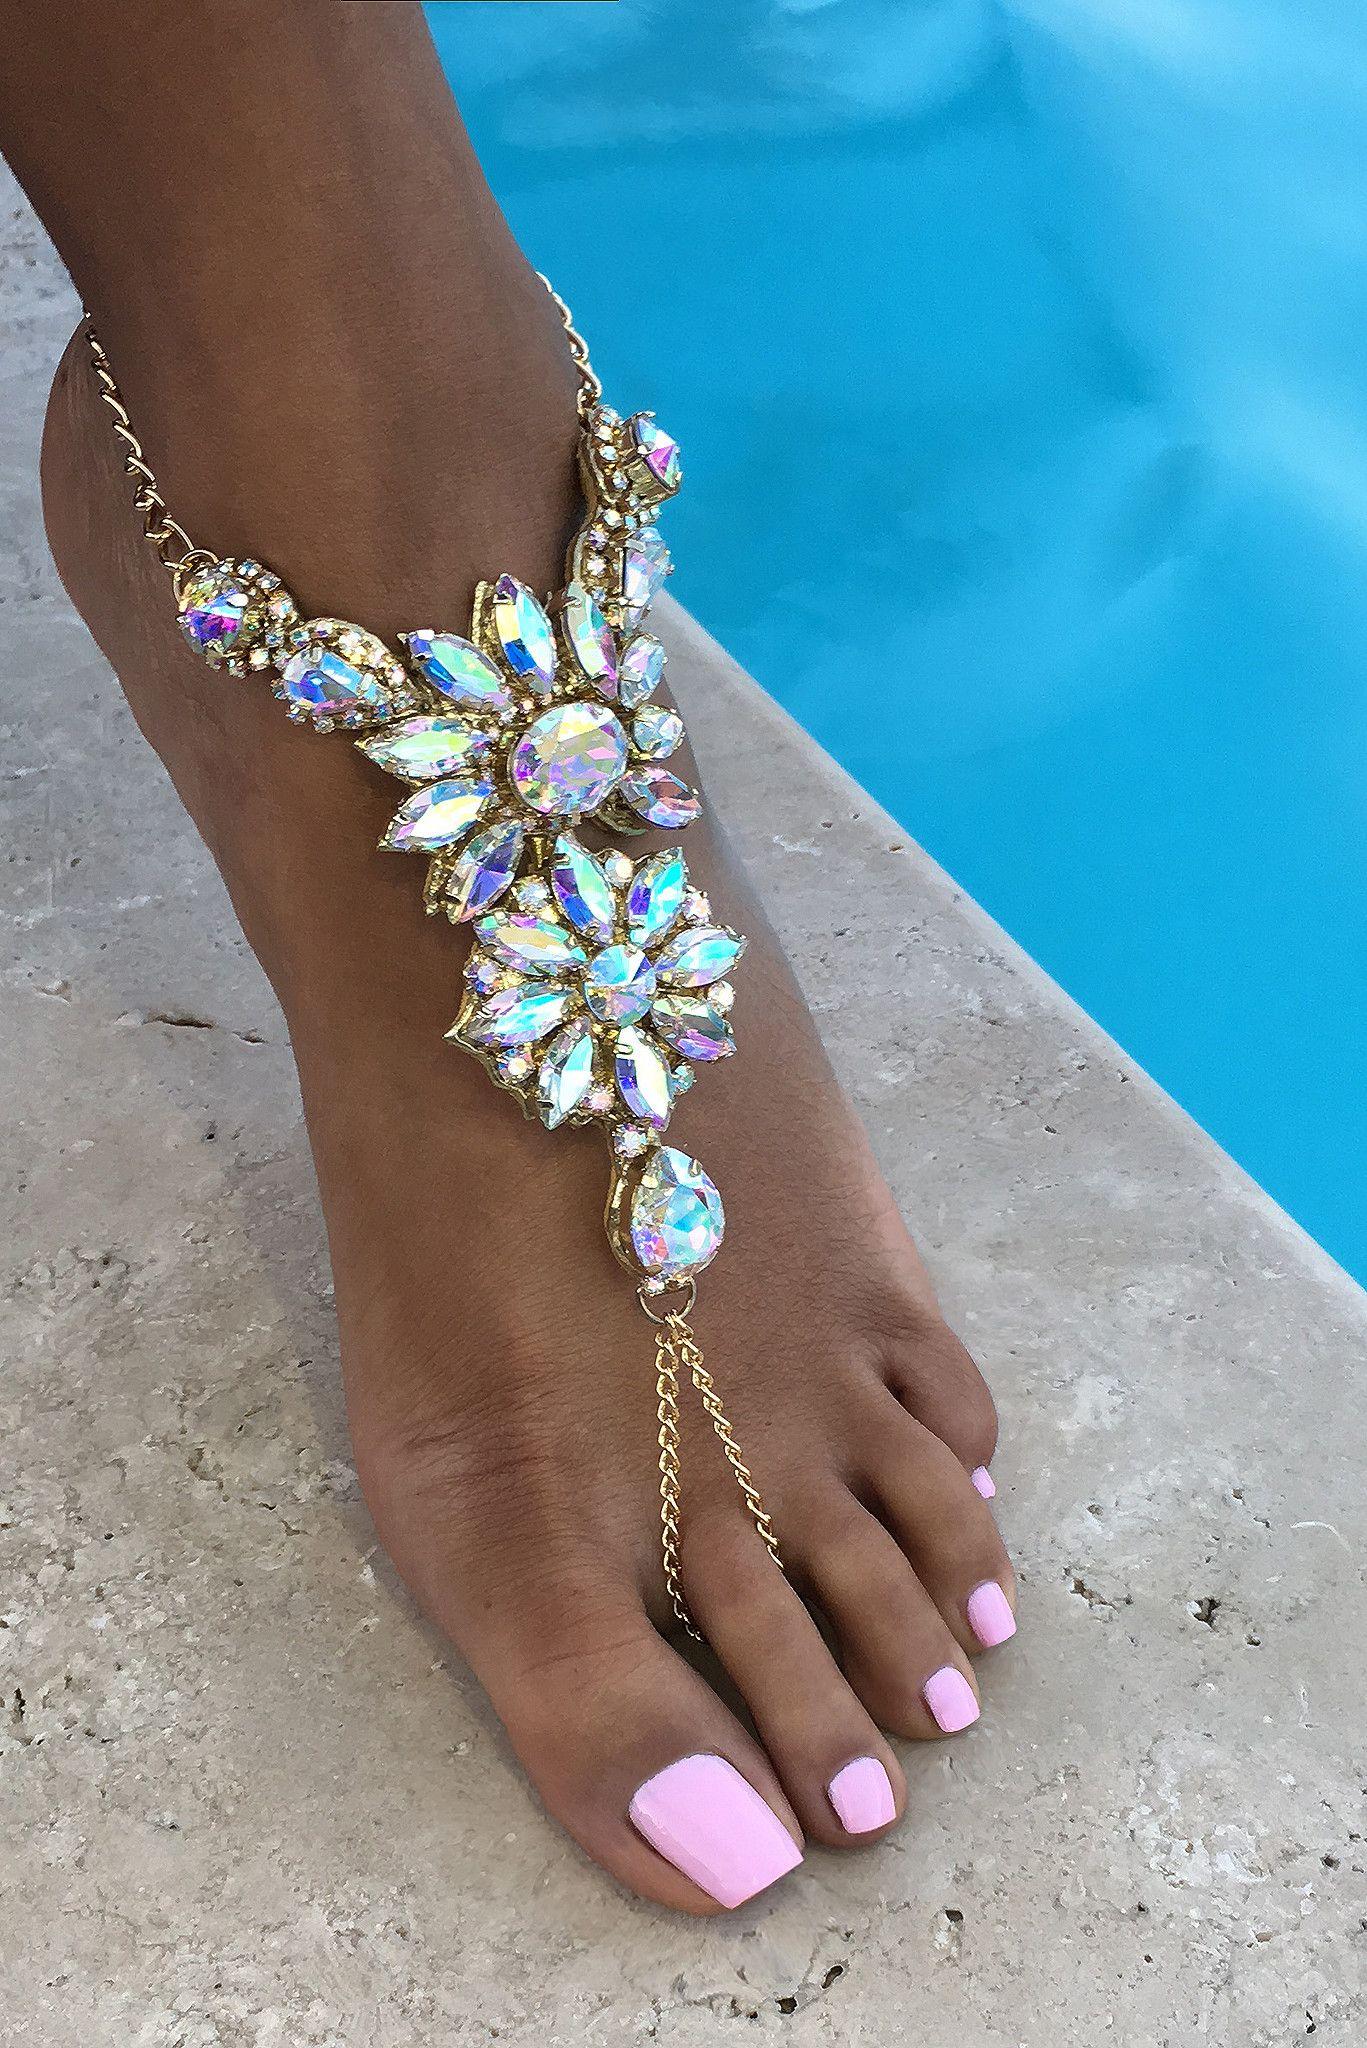 e51cbfe04efe Crystal Barefoot Sandals